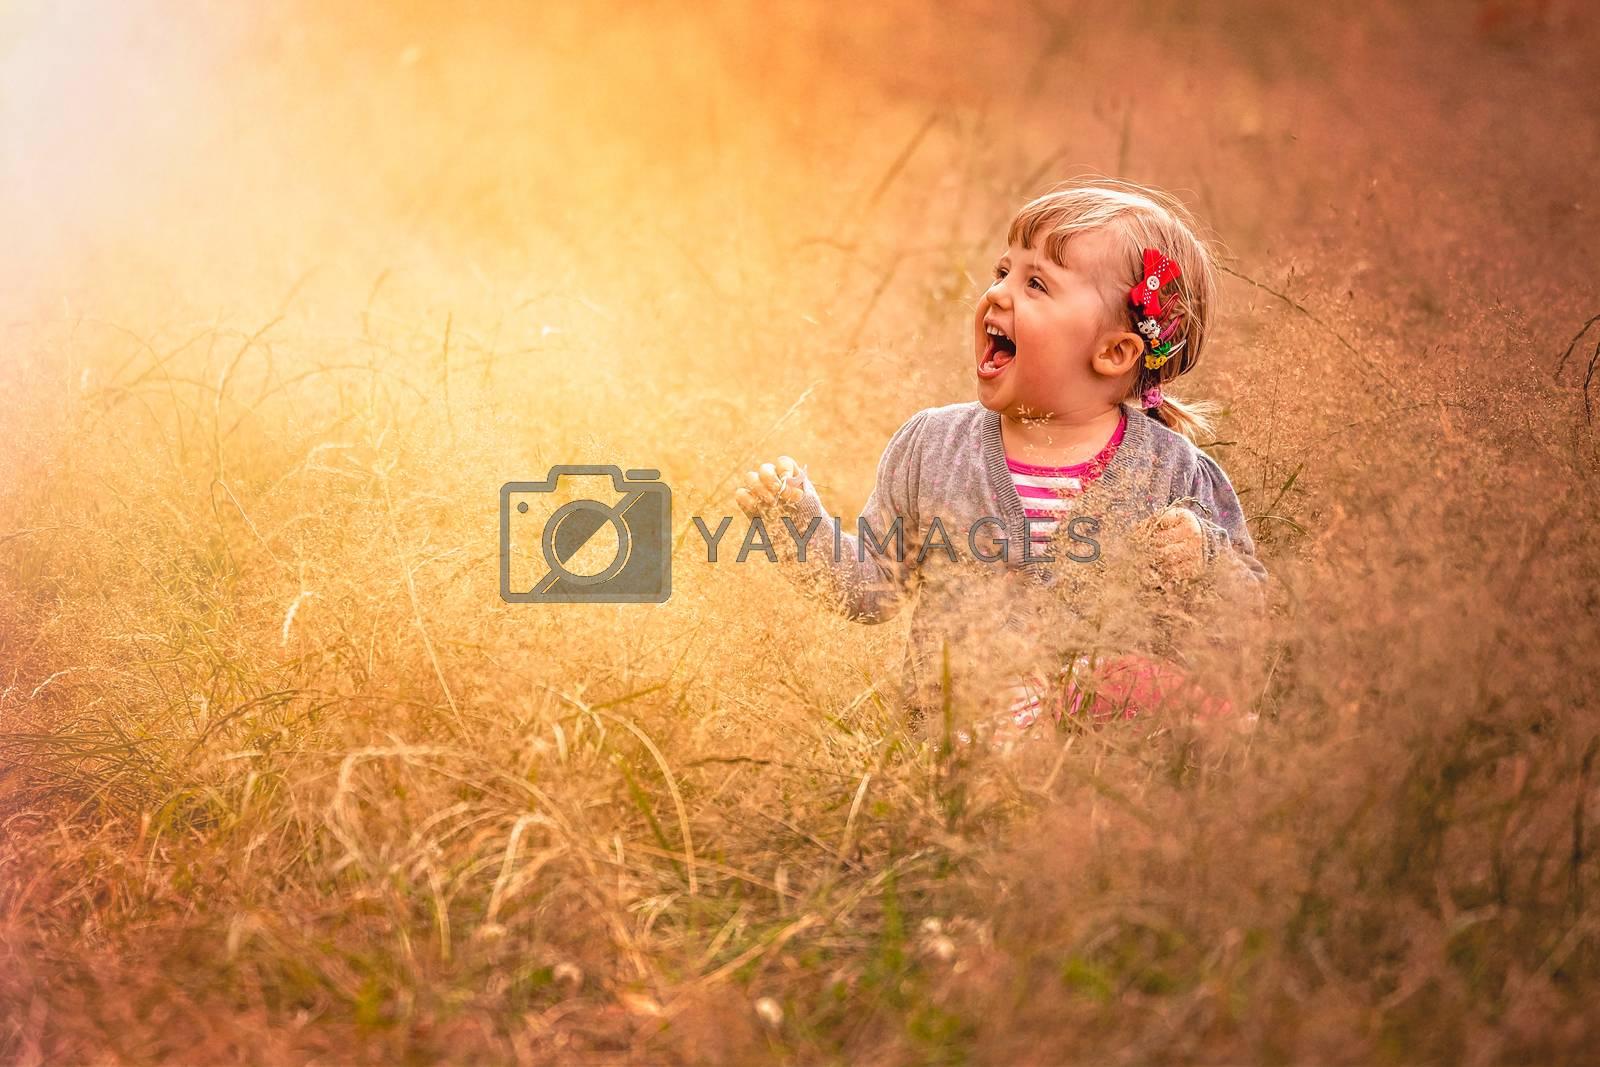 Cute little girl in the high grass in summer